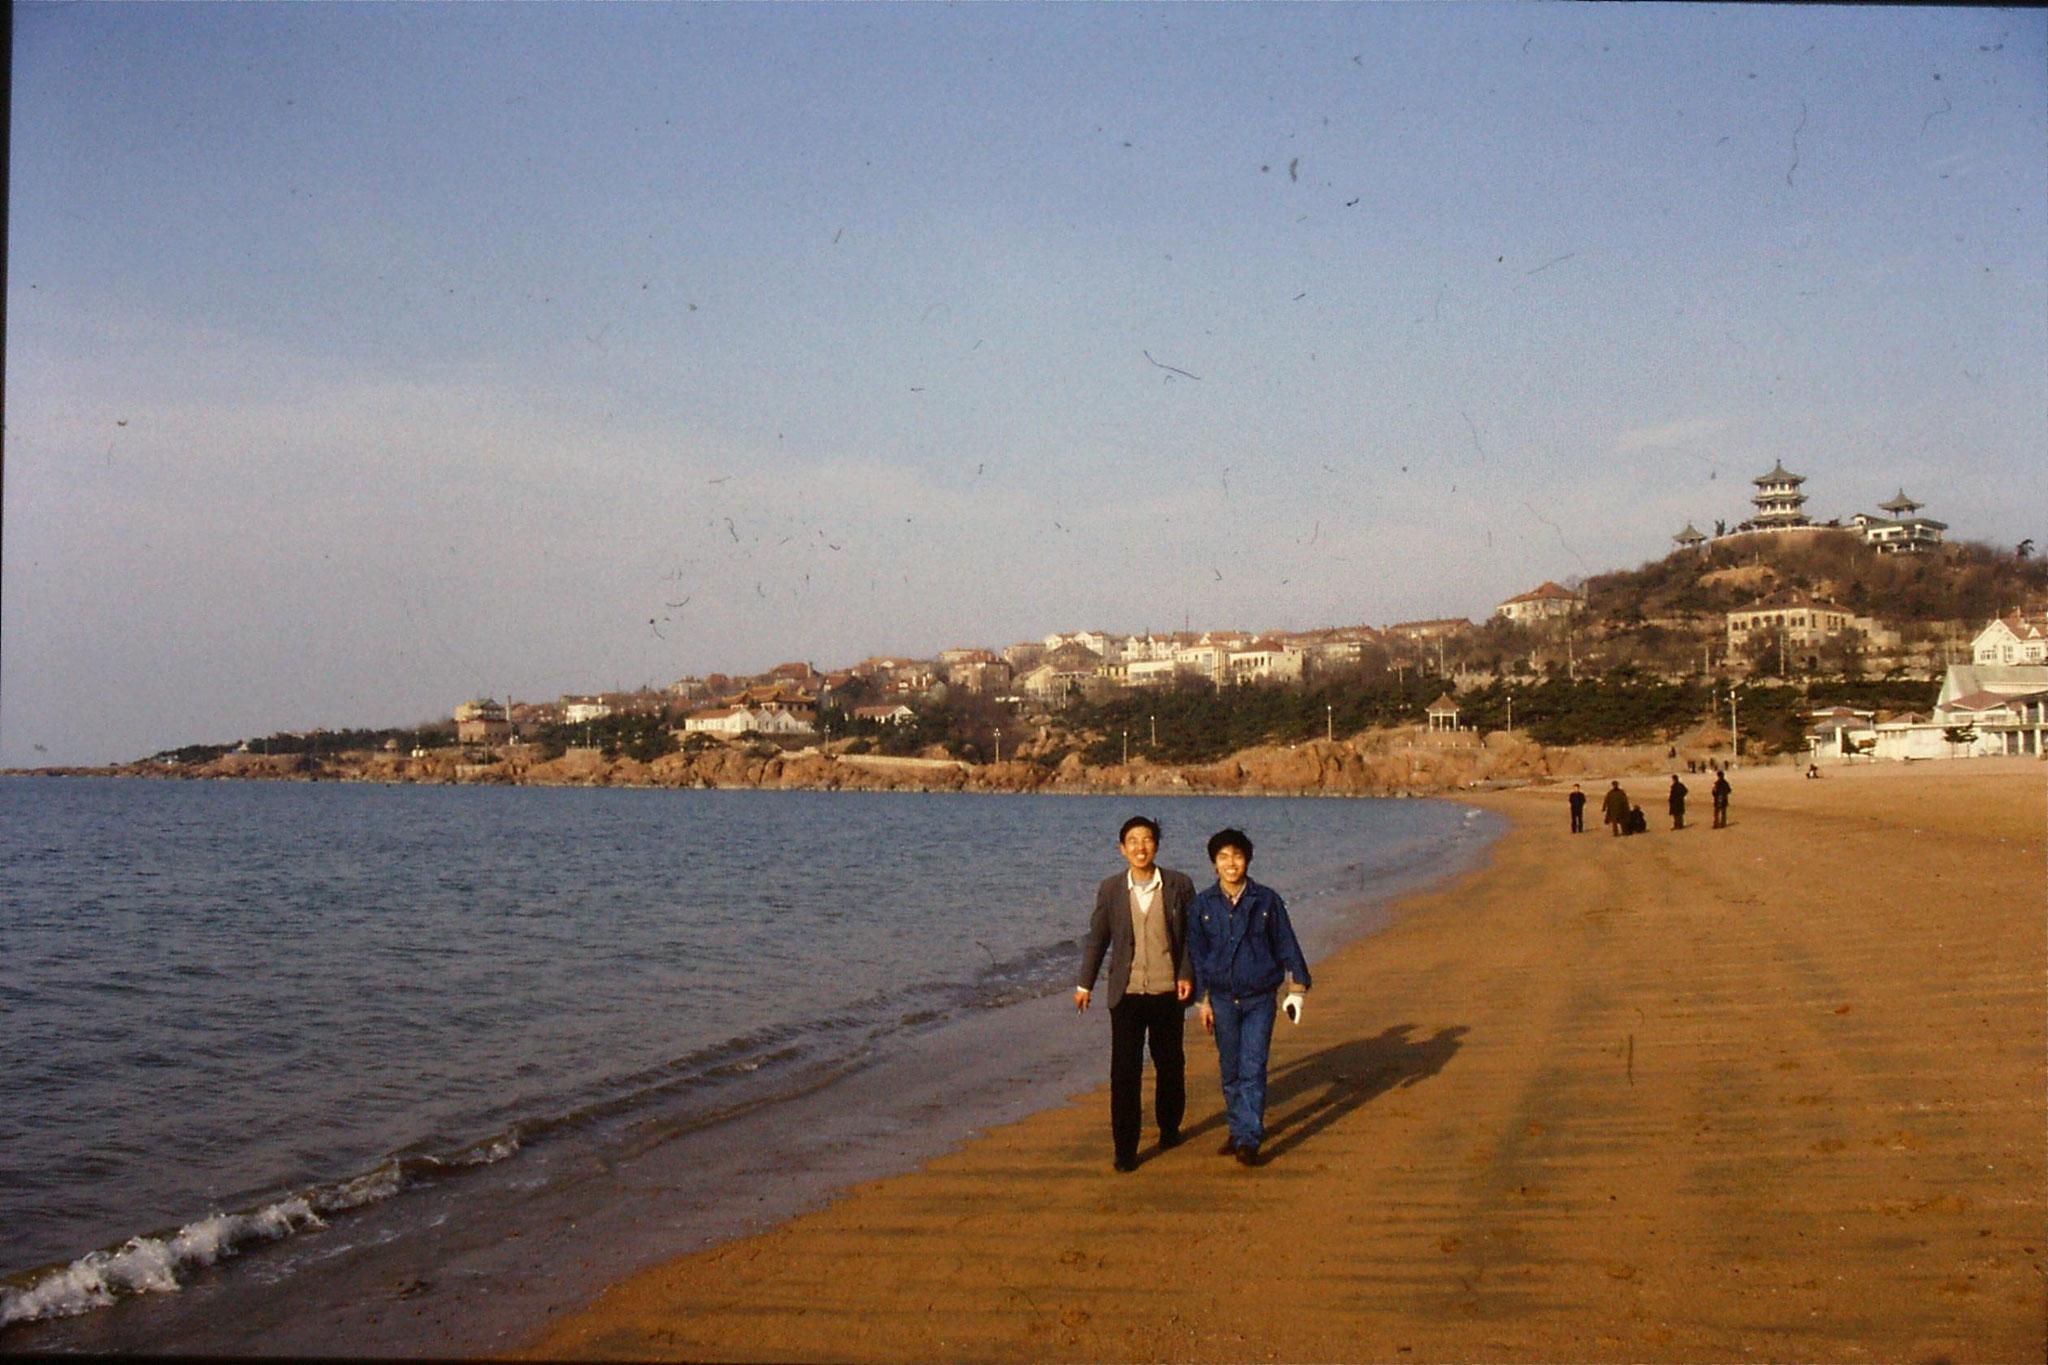 14/2/1989: 2: Qingdao beach